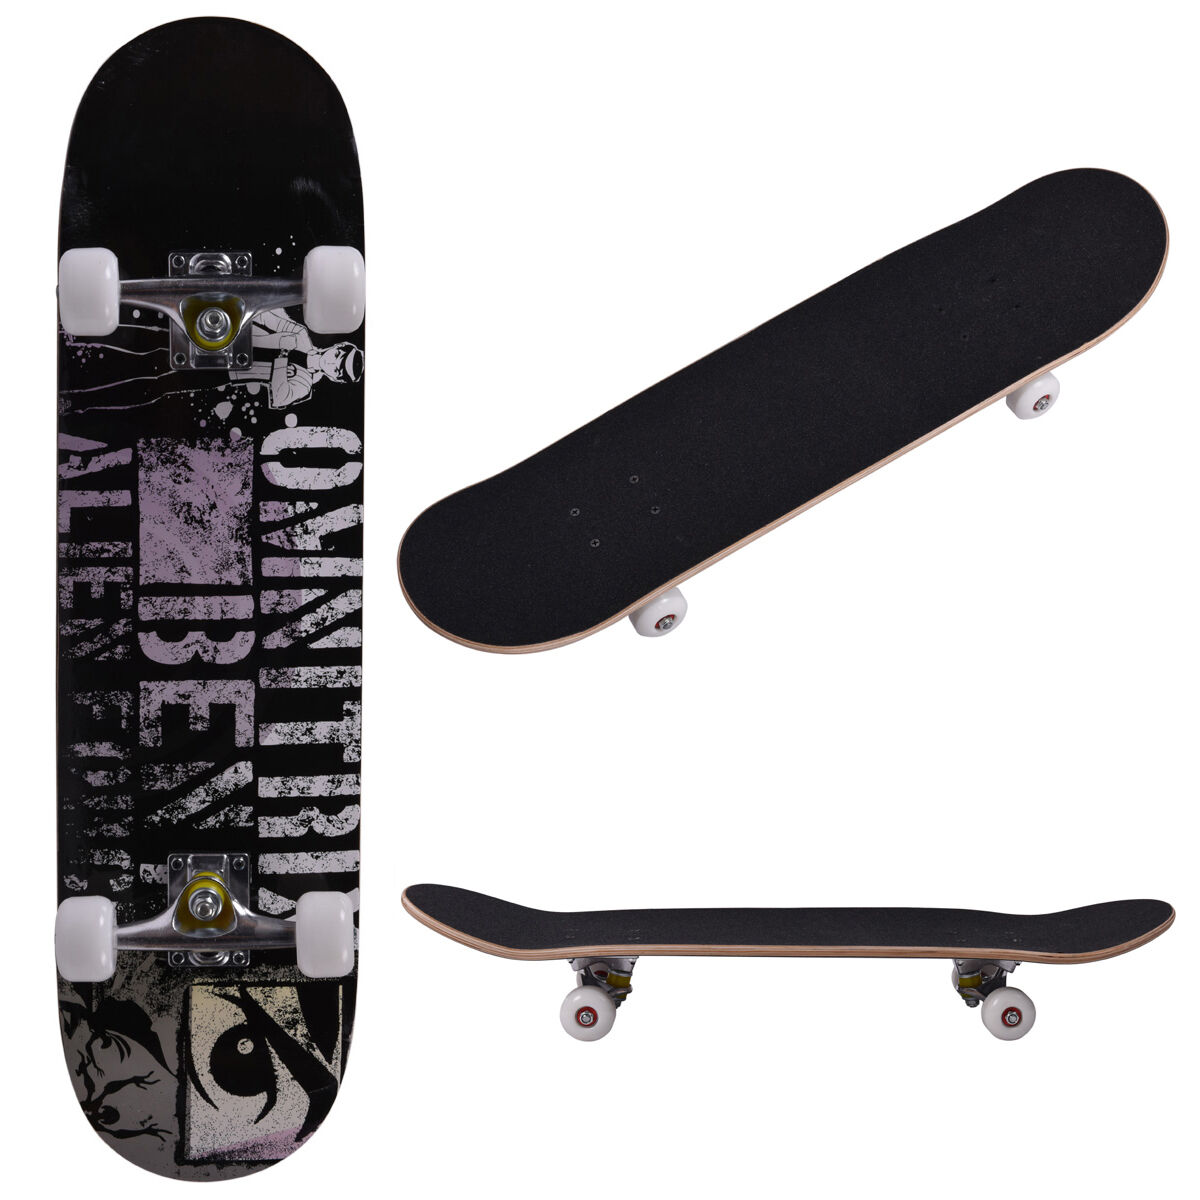 31\ x 8\ Professional Adult Maple Deck Skateboard Complete Wheel Trucks Wood